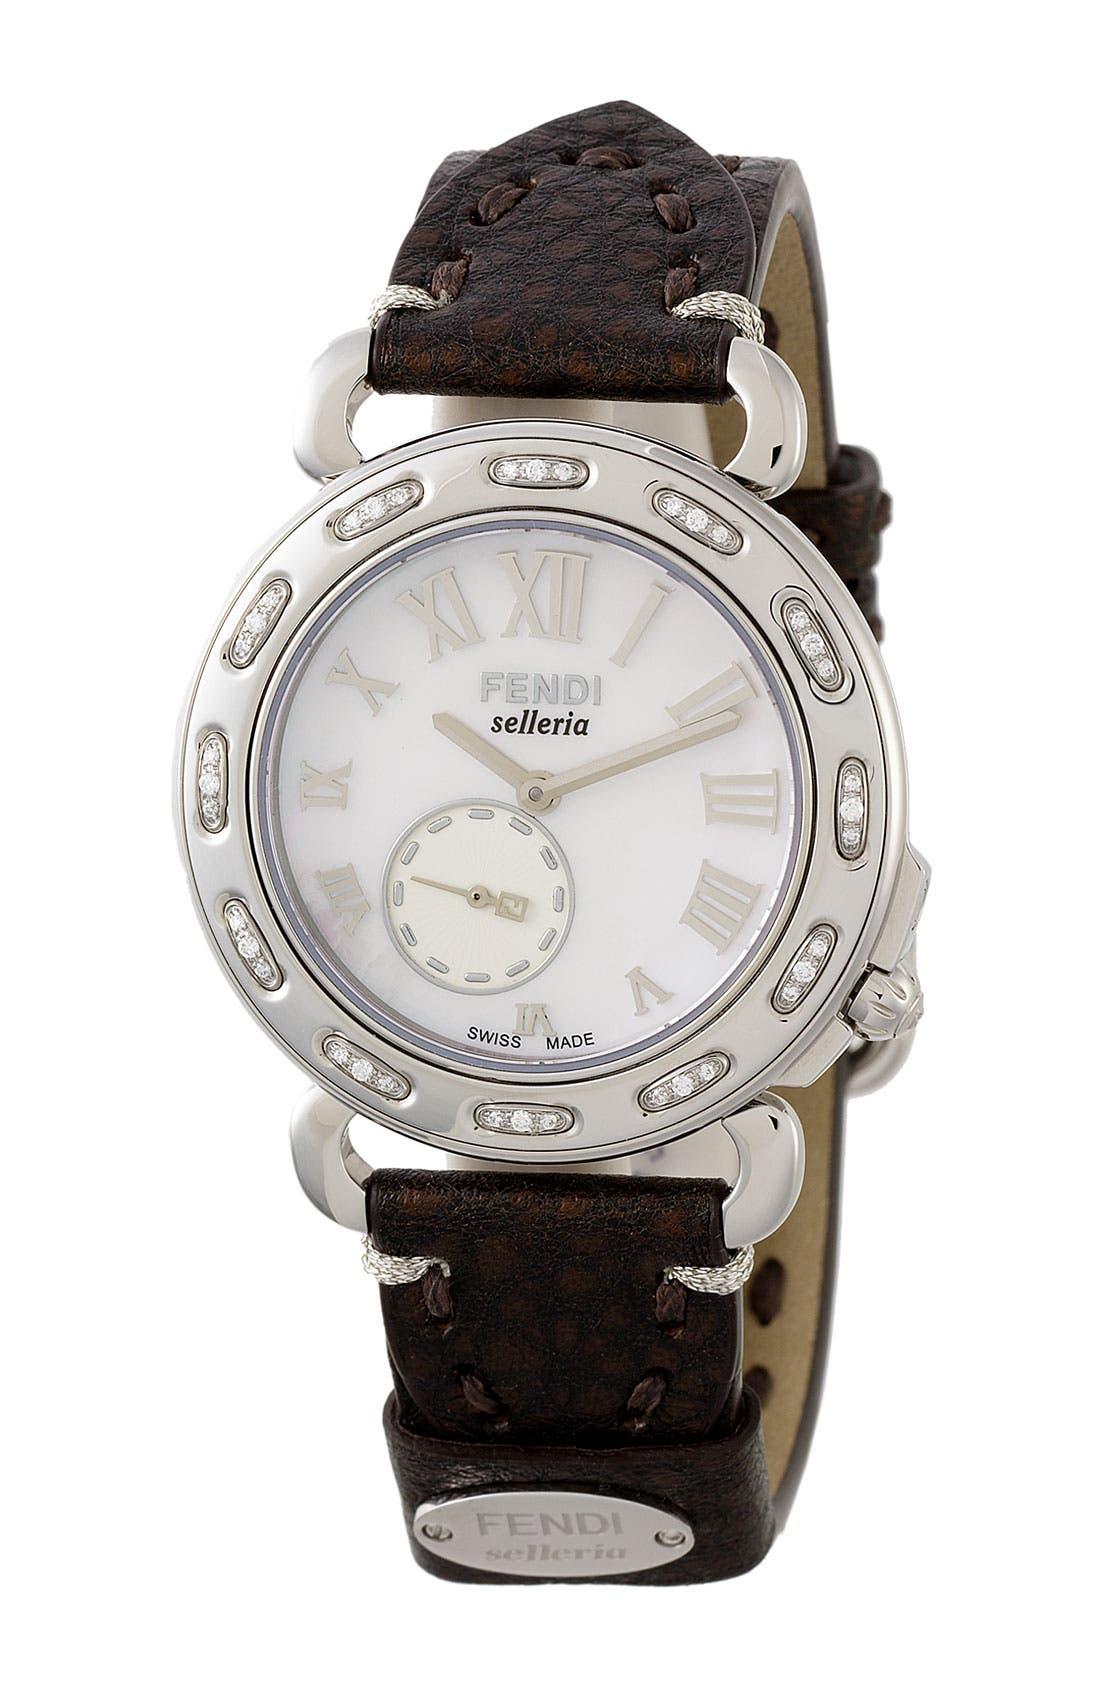 Main Image - Fendi 'Selleria' Diamond Customizable Watch